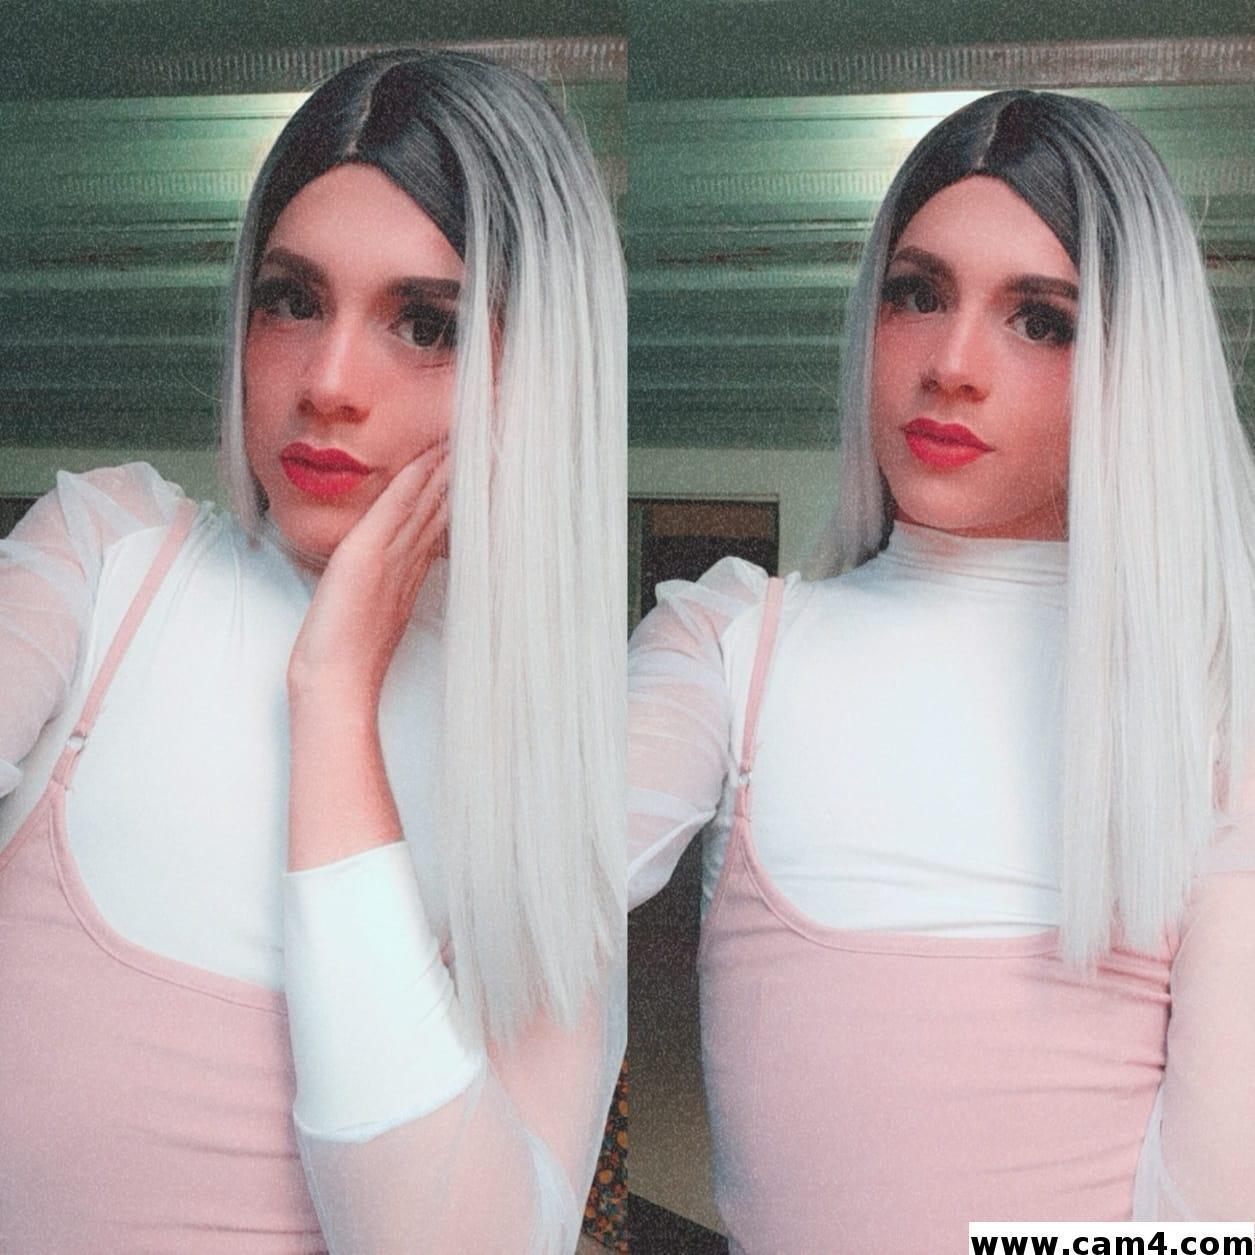 Arianna queen?s=253gr1w9vmd5pkqeutfrjm2sgkwjdillmrrv05emexu=